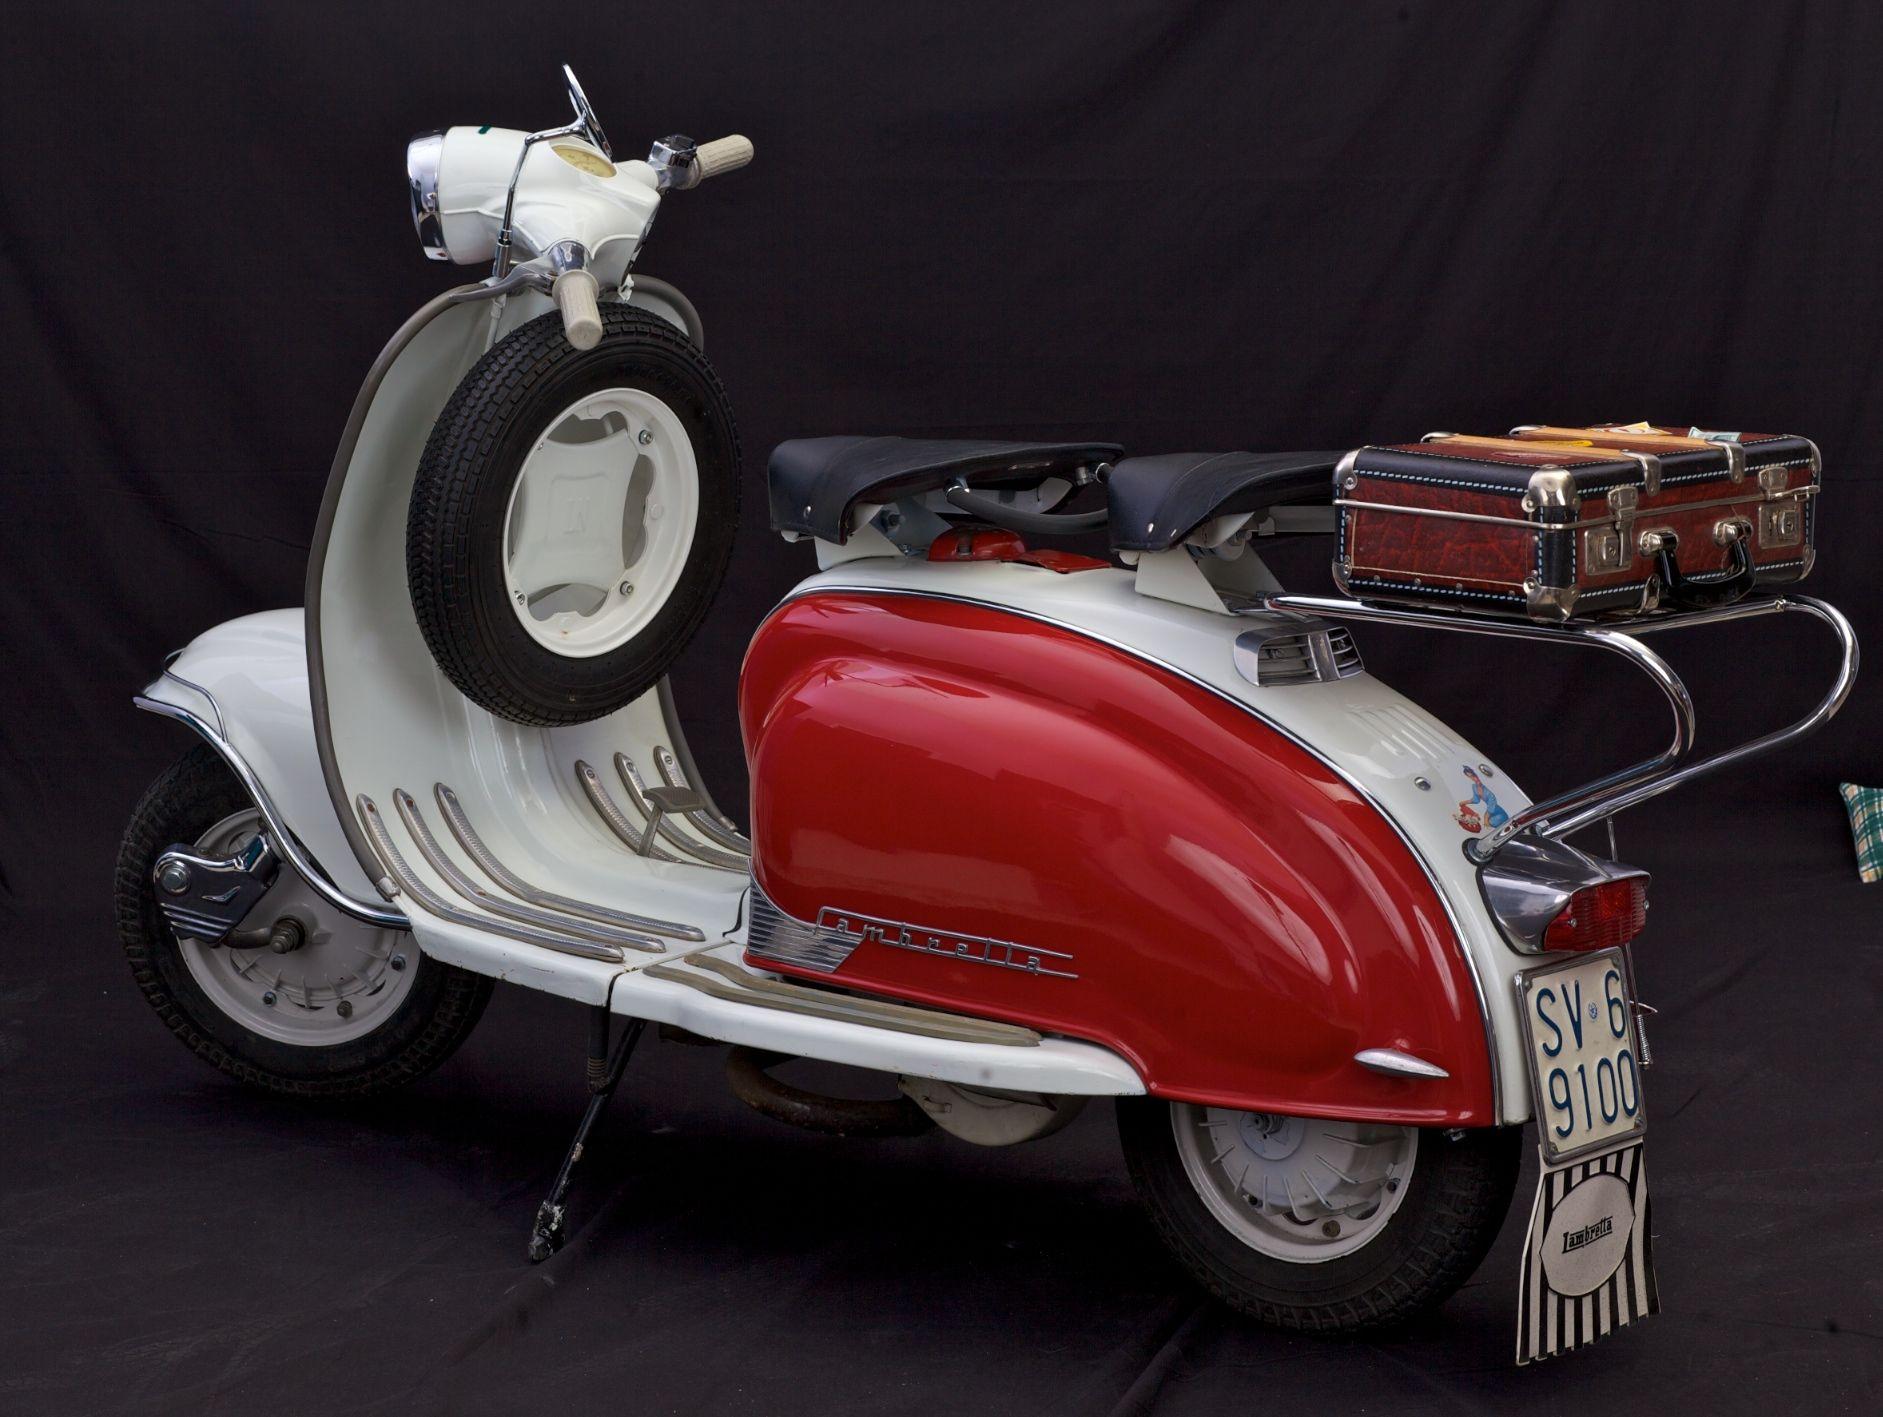 vintage italian scooter - HD1883×1417